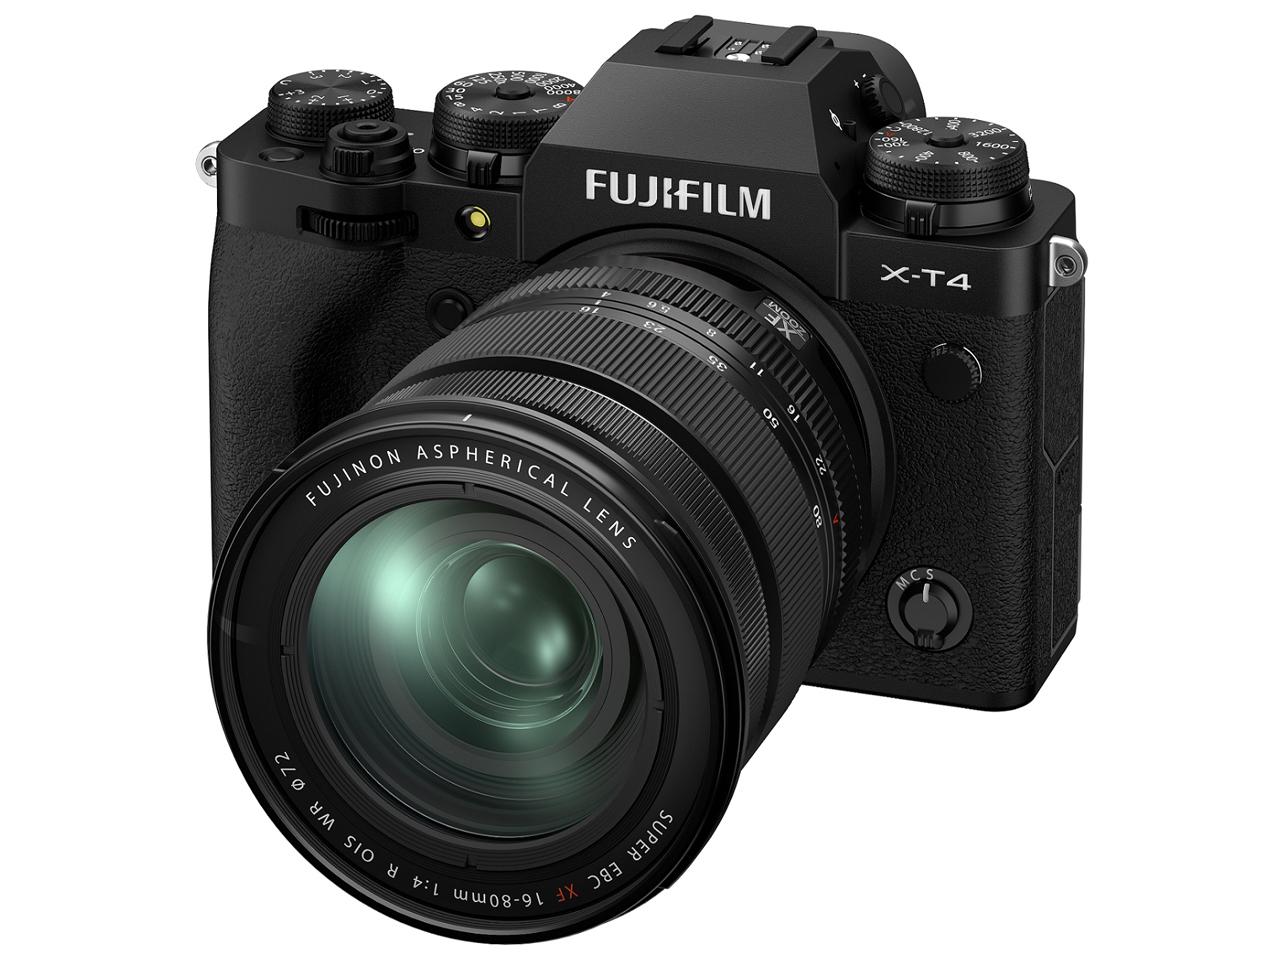 FUJIFILM X-T4 レンズキット [ブラック]【お取り寄せ(メーカー取り寄せ/予約受付中)】※2ヶ月以上